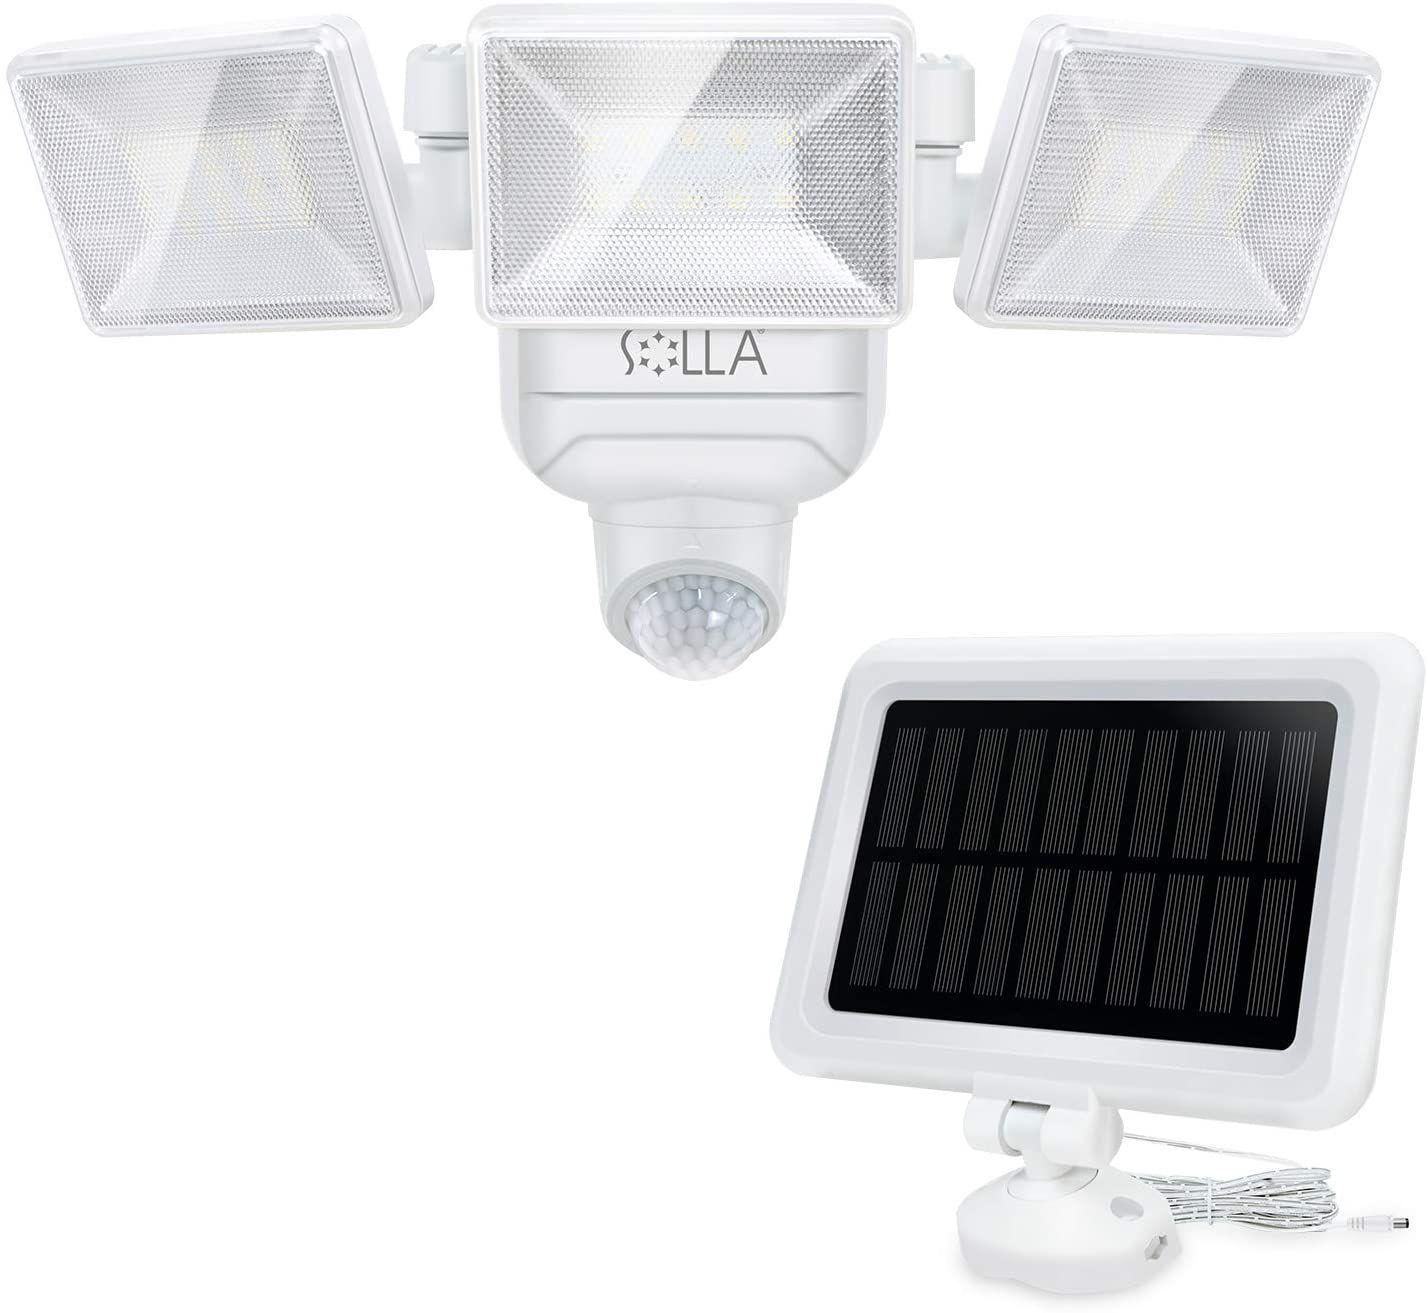 Foco Solar Exterior Regulable Solla Con Sensor De Movimiento